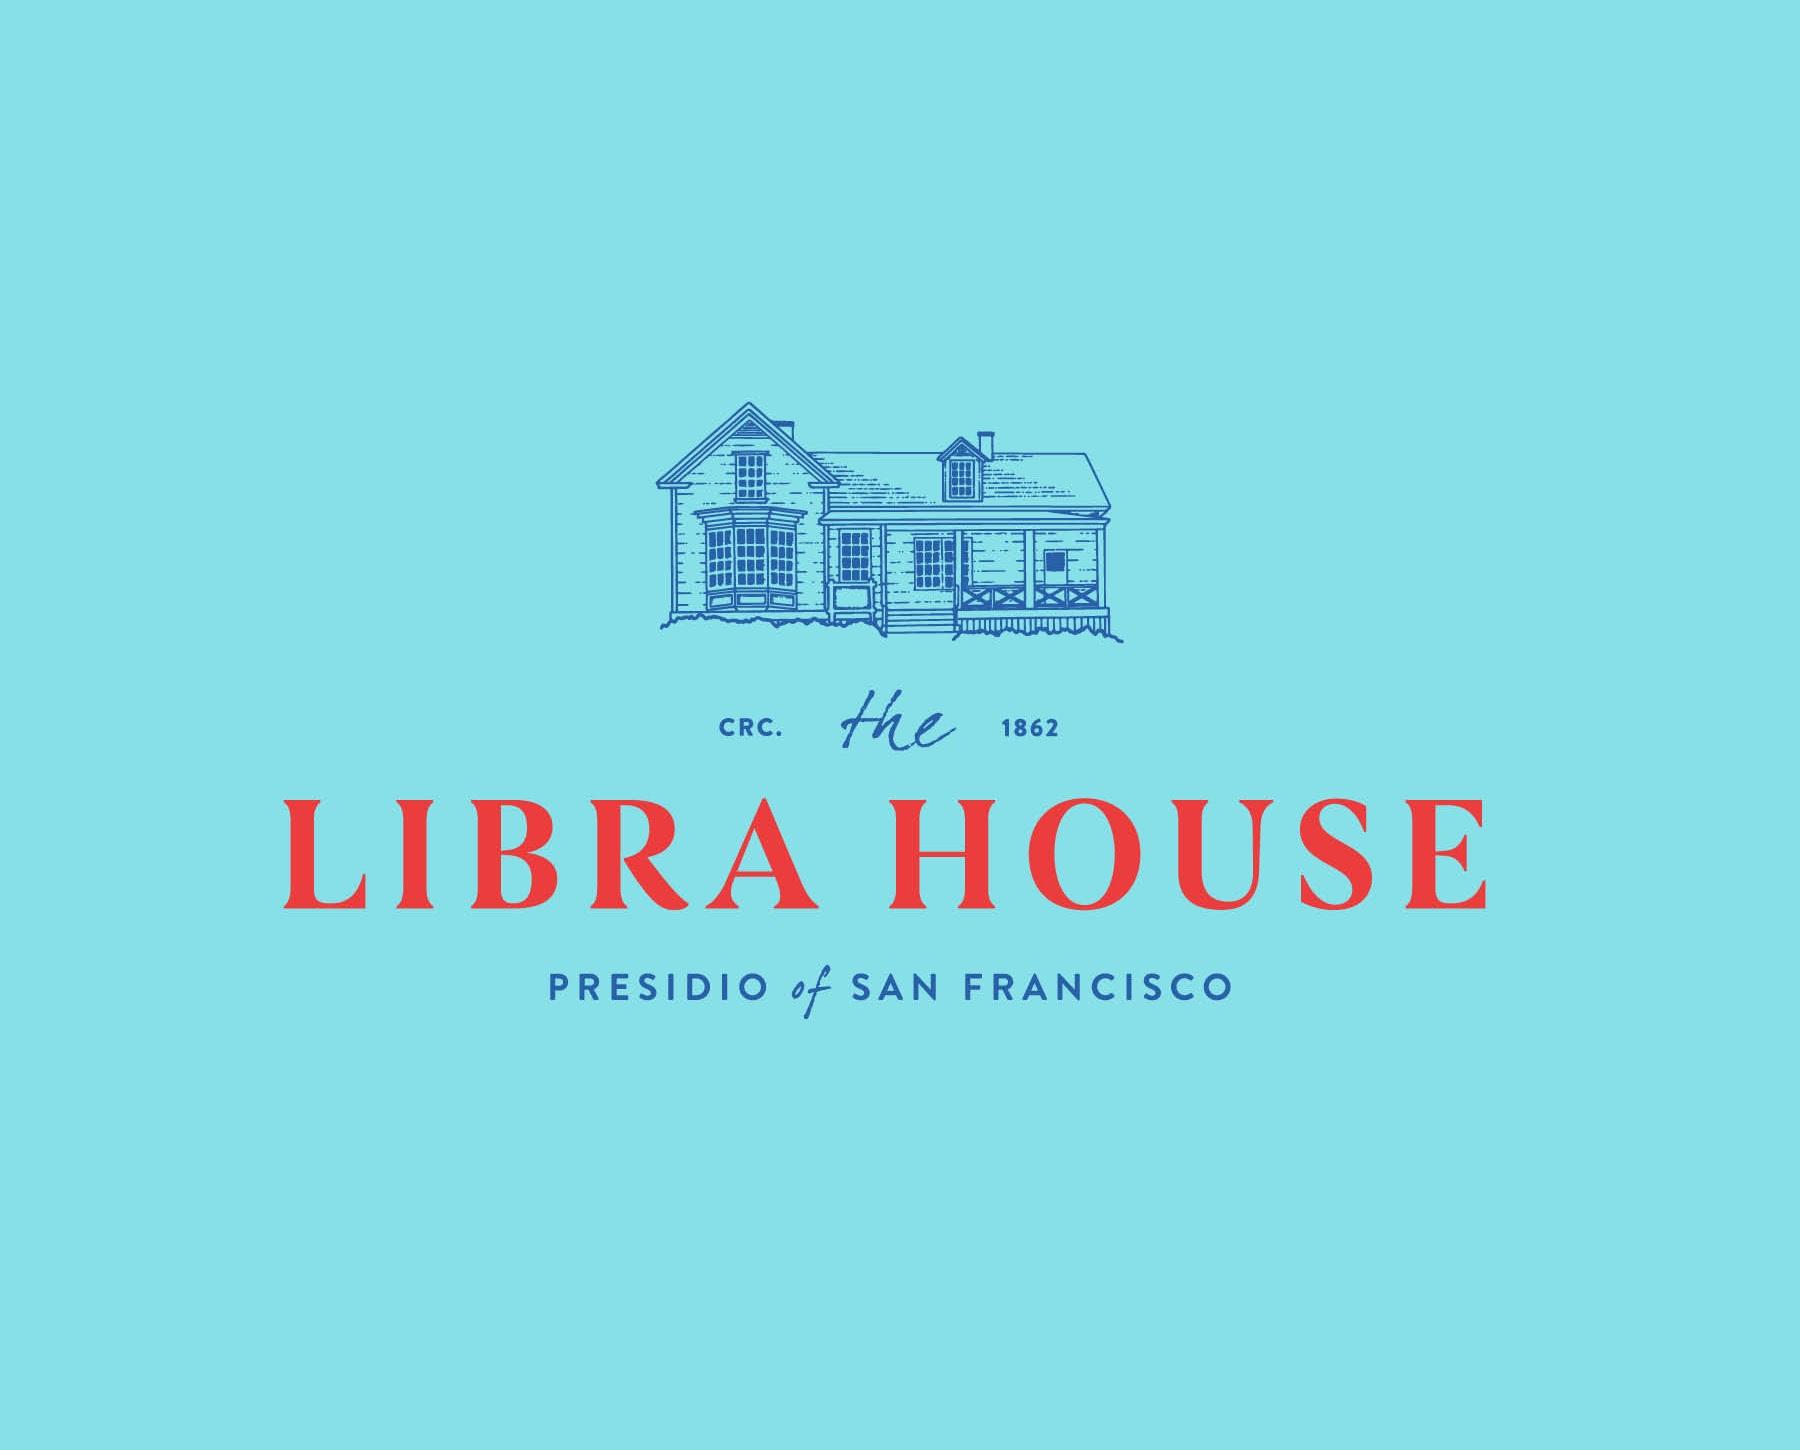 The Libra House